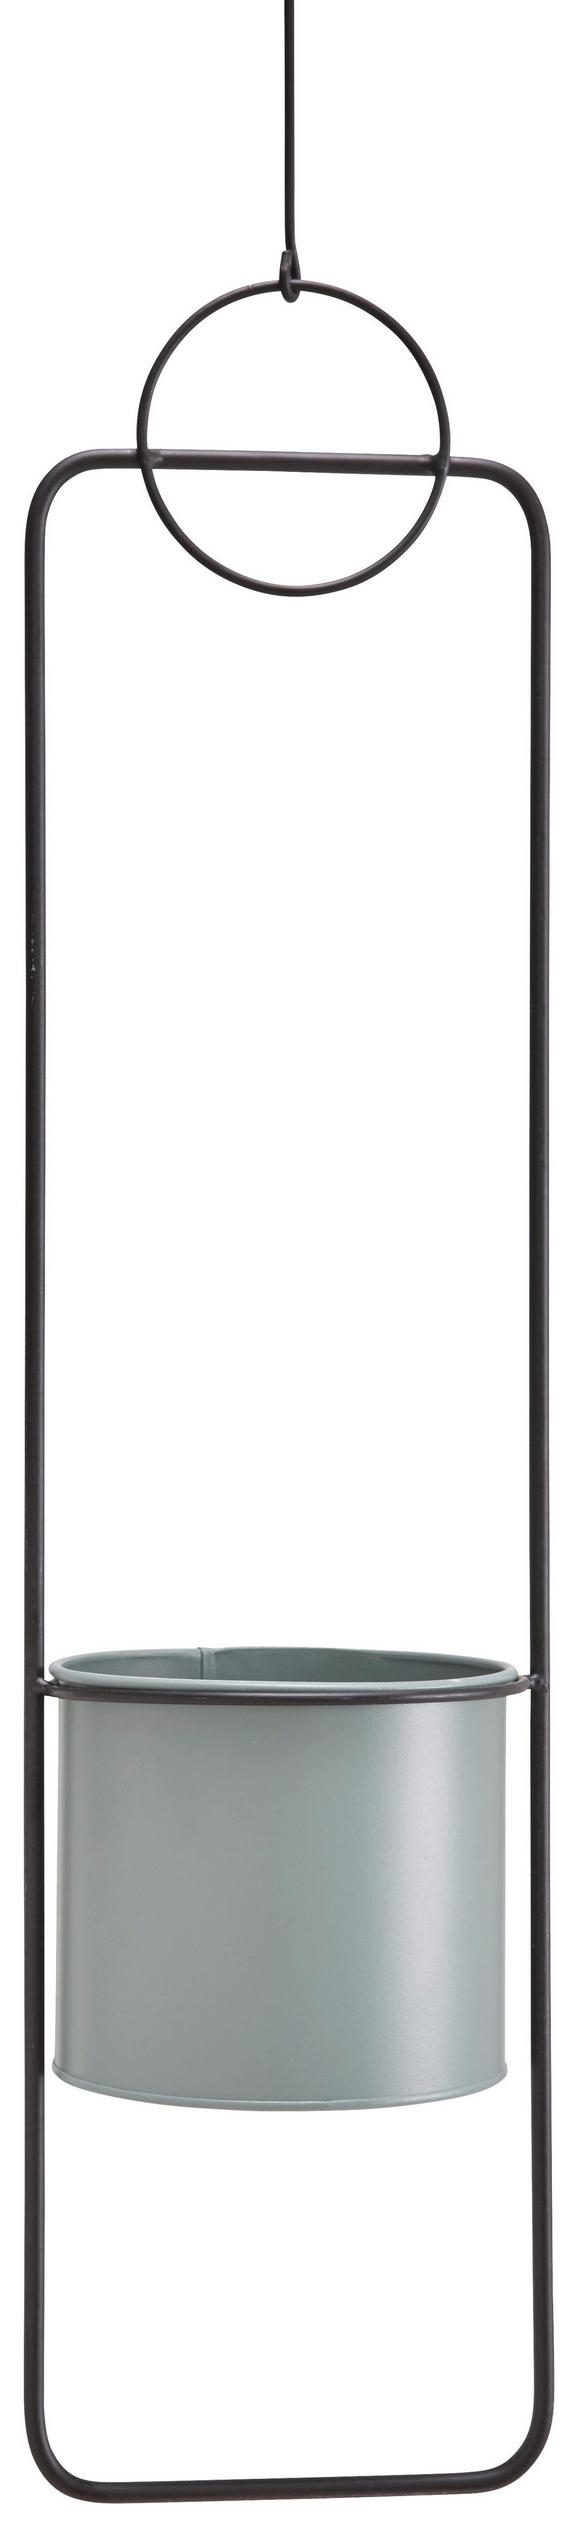 Pflantopfhänger Frame aus Metall ca. 89 cm - Schwarz, LIFESTYLE, Metall (17/15,5/89cm)